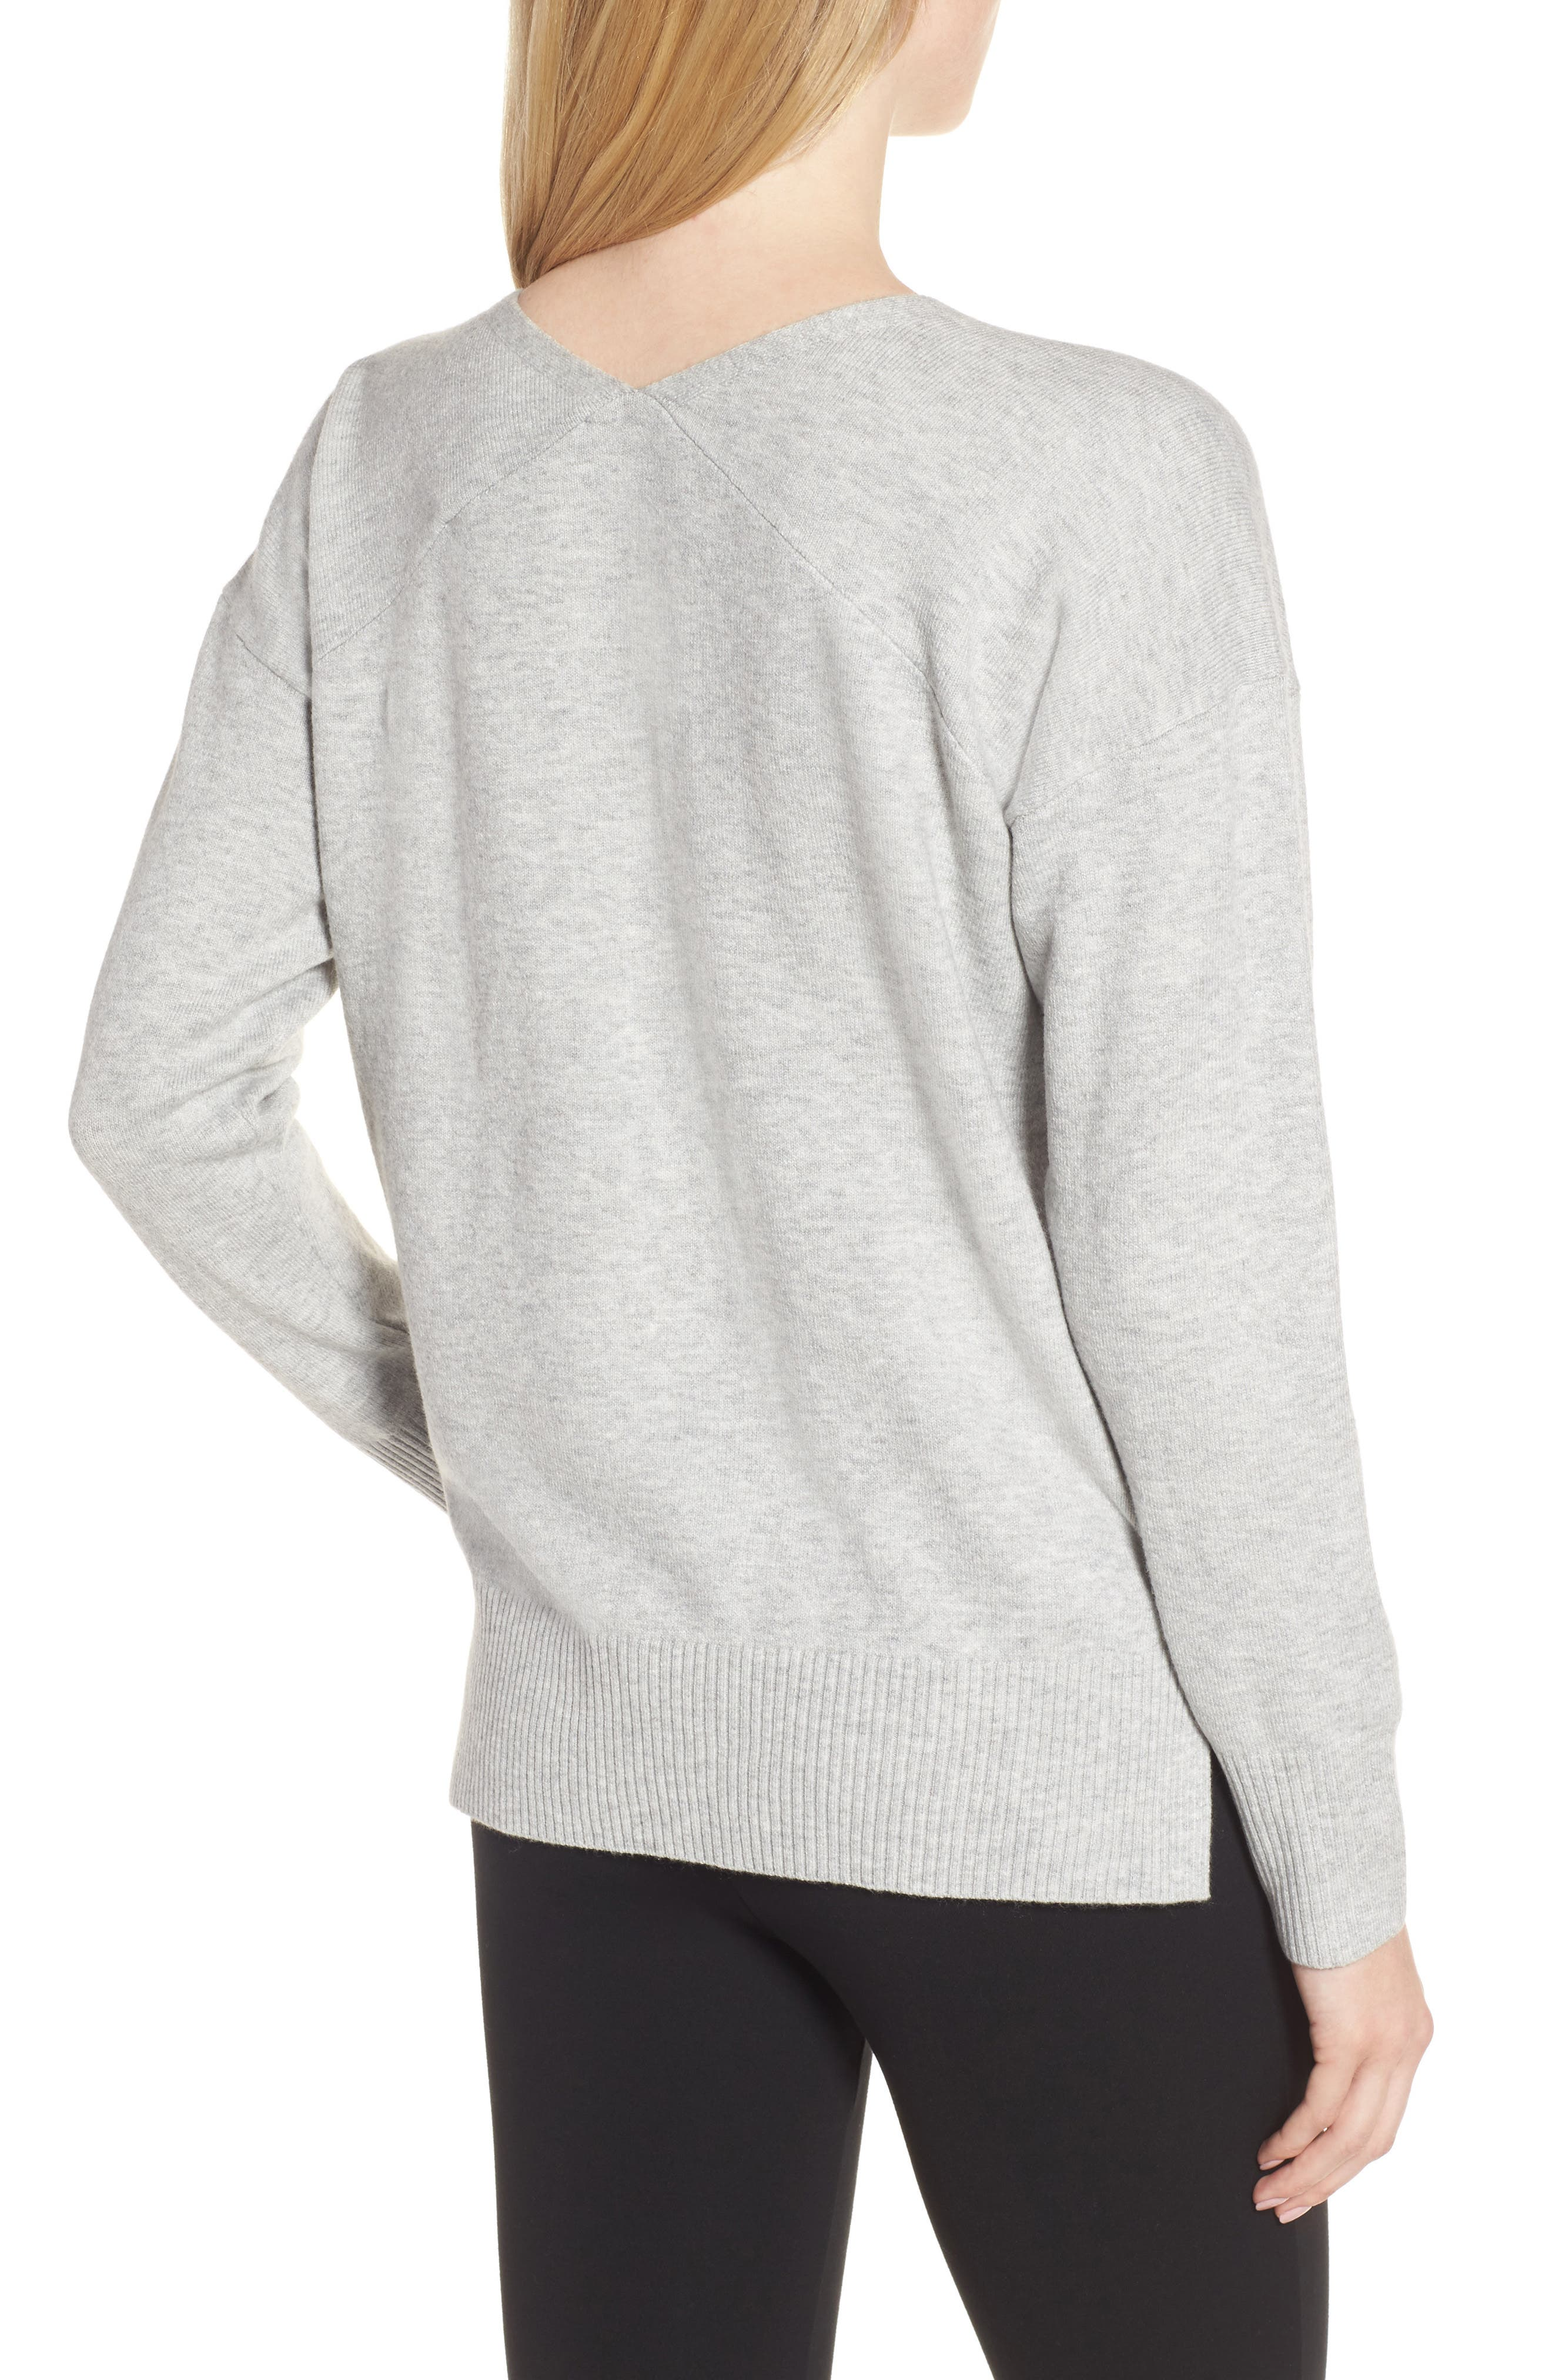 Della Vhari V-Neck Sweater,                             Alternate thumbnail 2, color,                             050